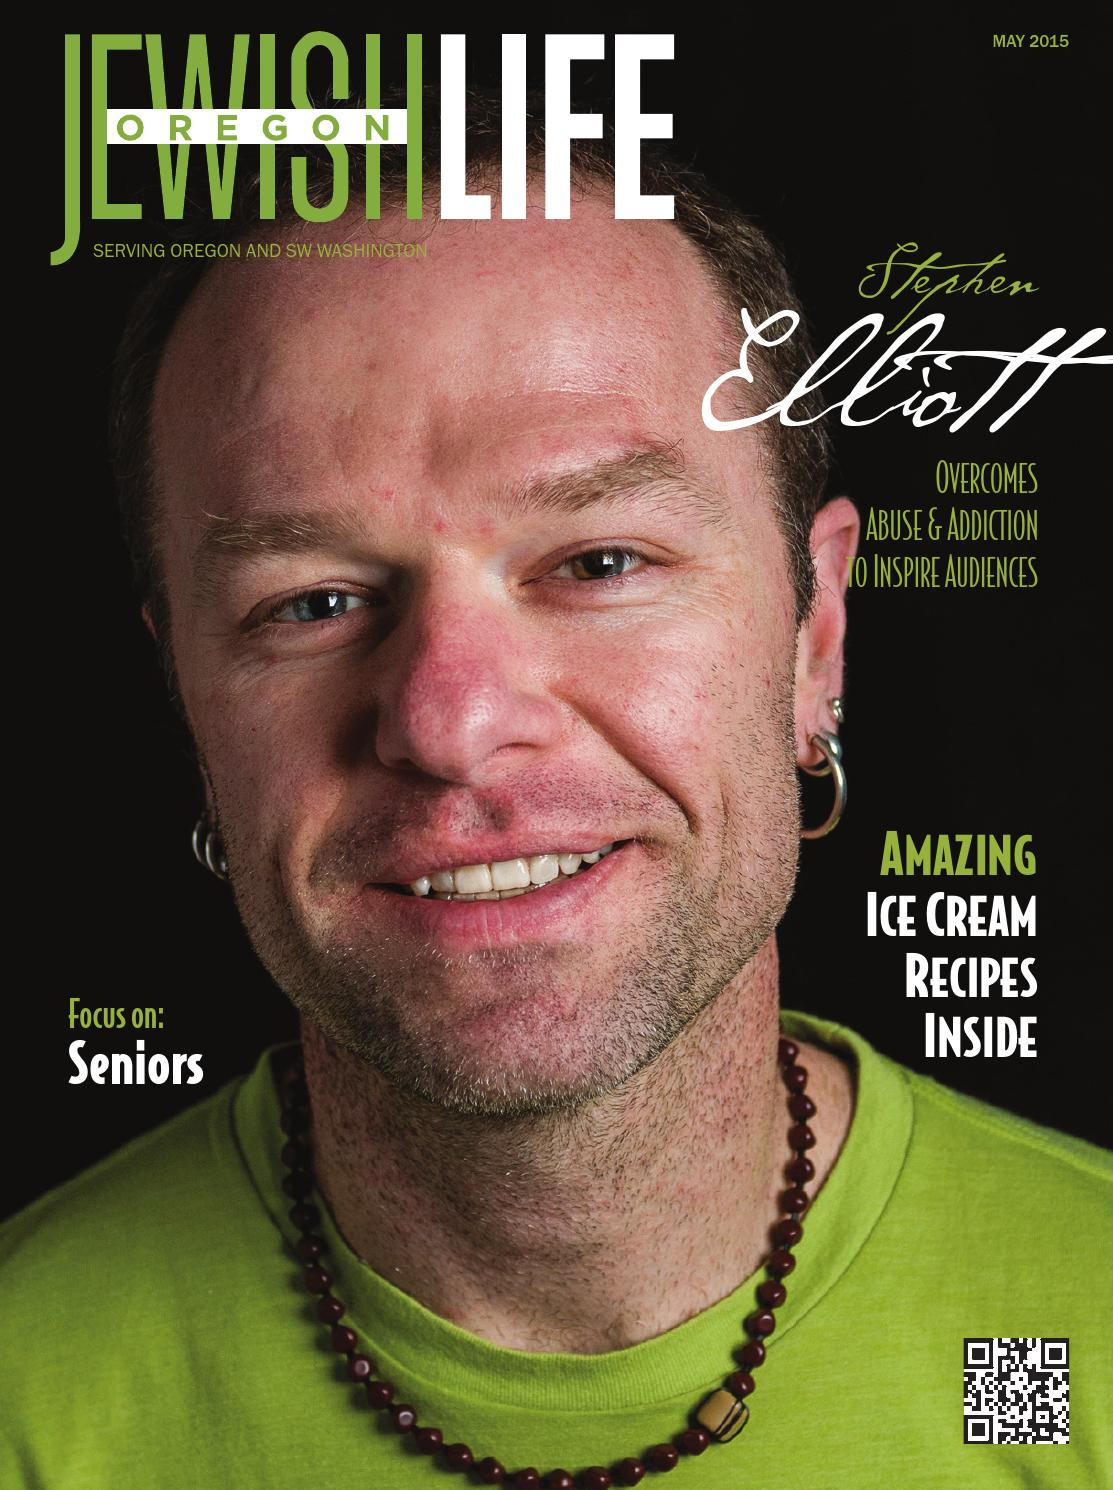 Oregon Jewish Life Vol. 4/ Issue 4 May